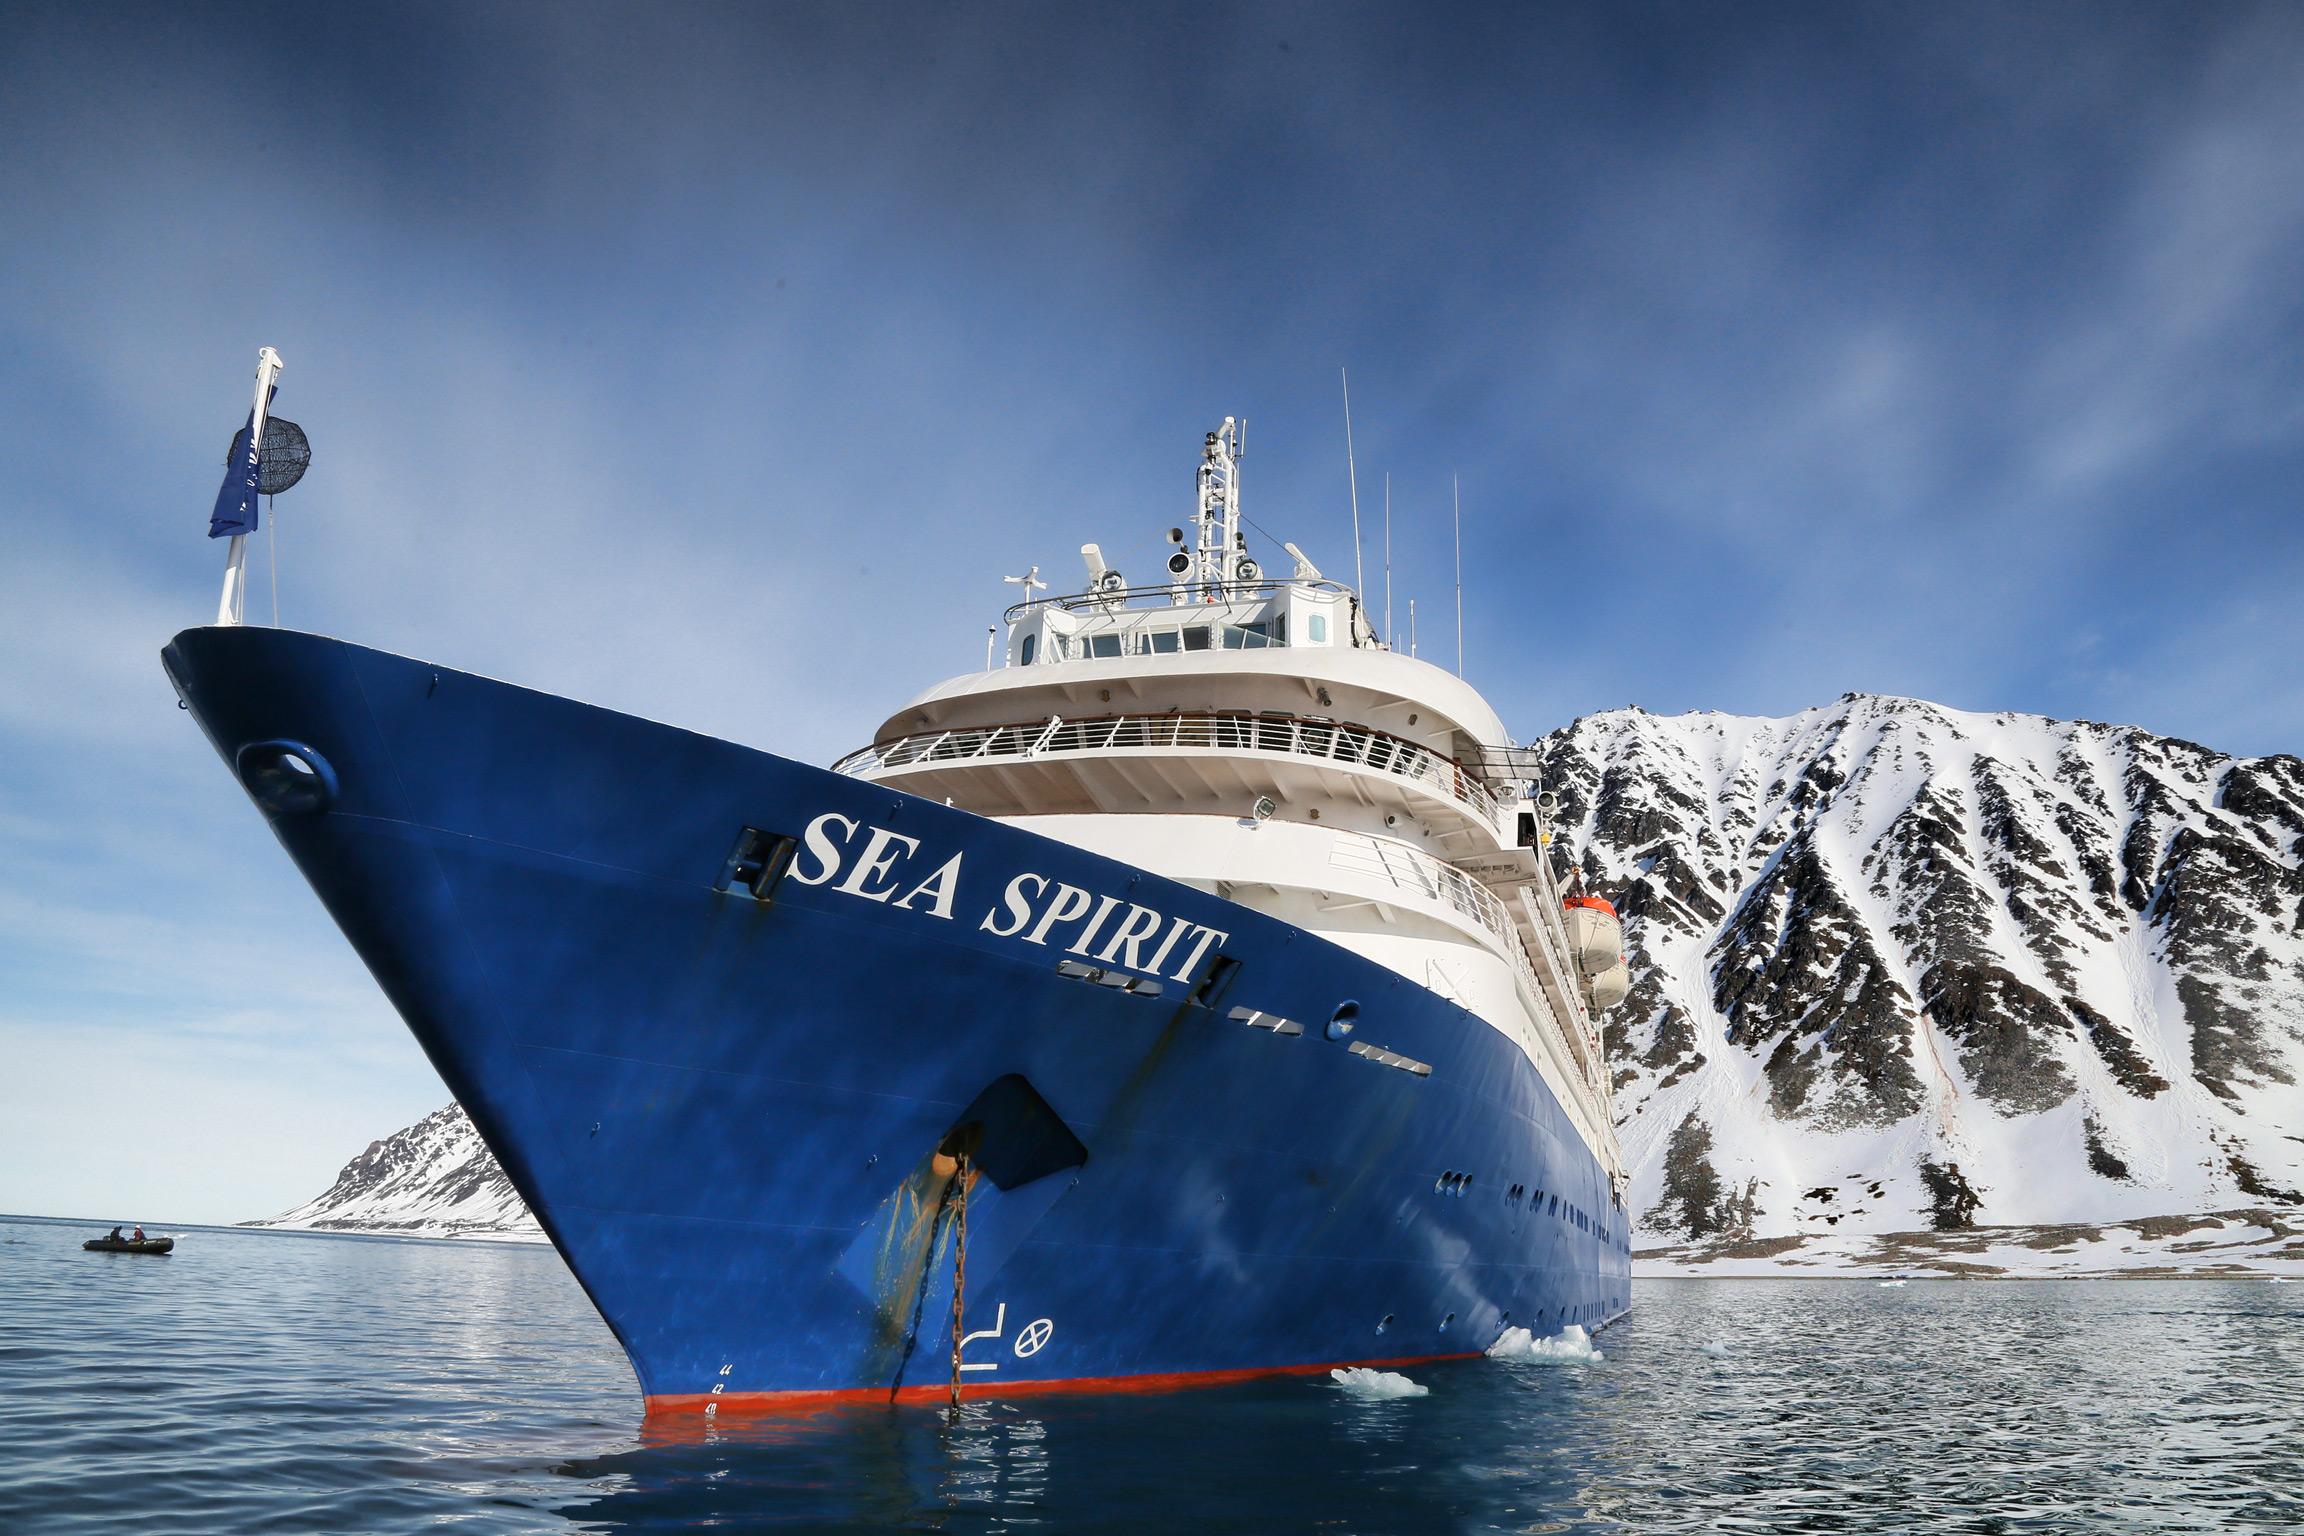 M/V Sea Spirit